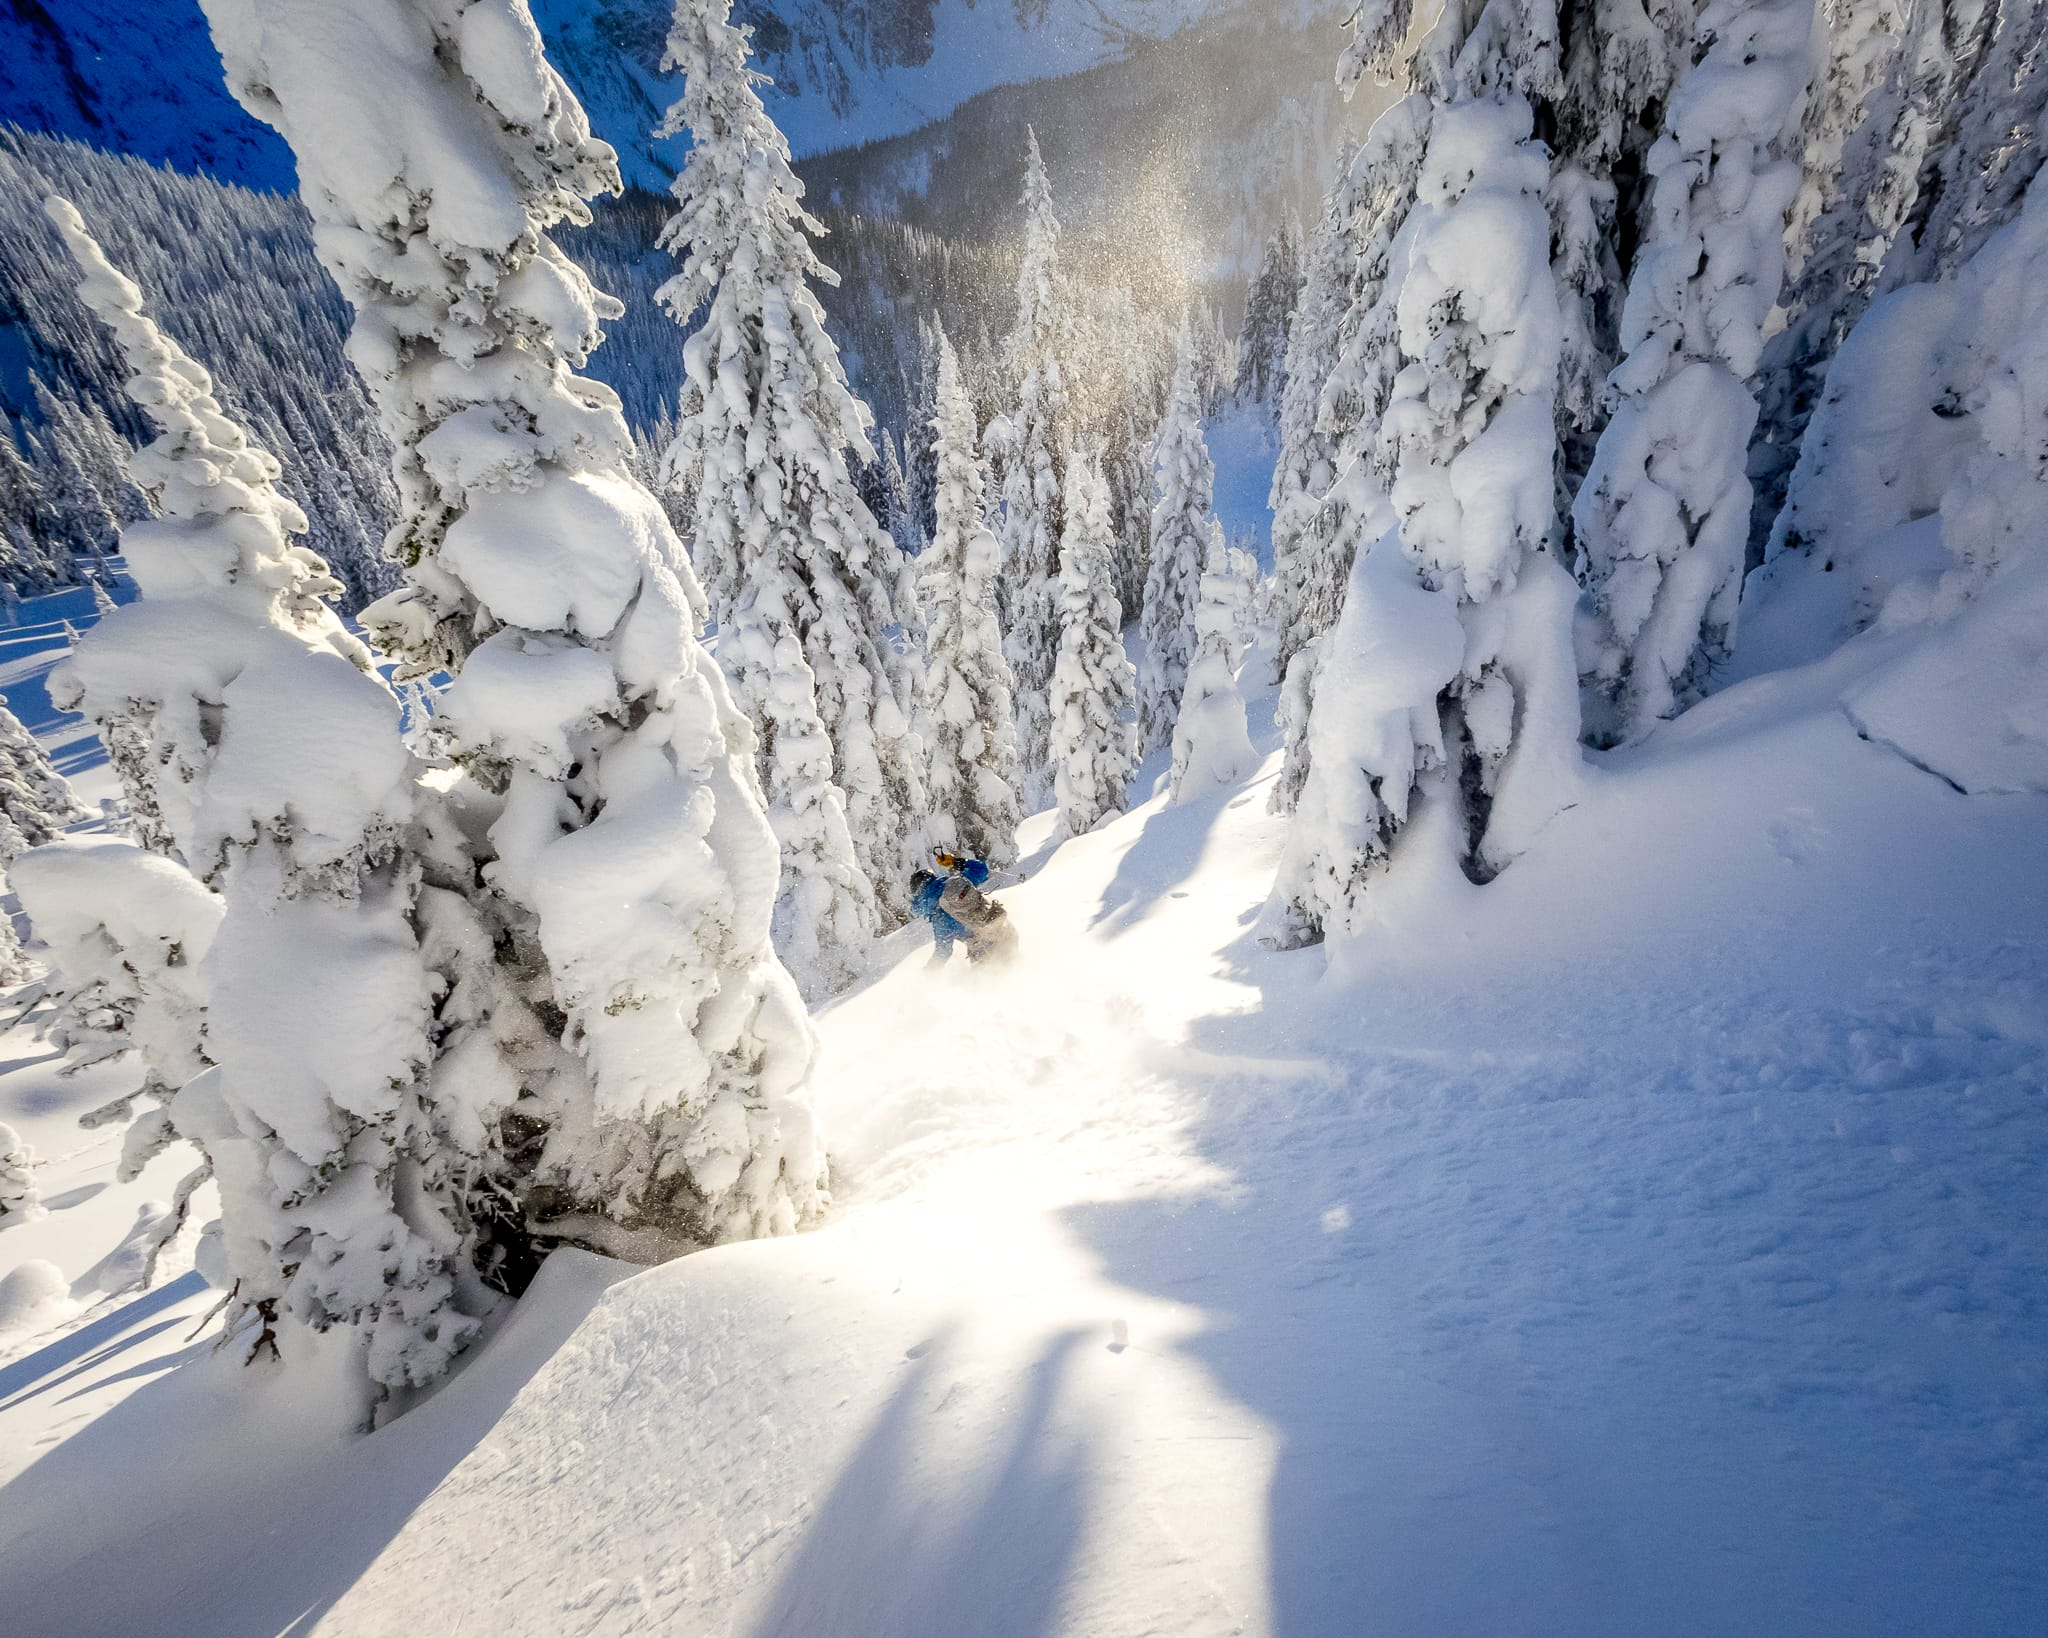 Trophy Hut skiing in powder